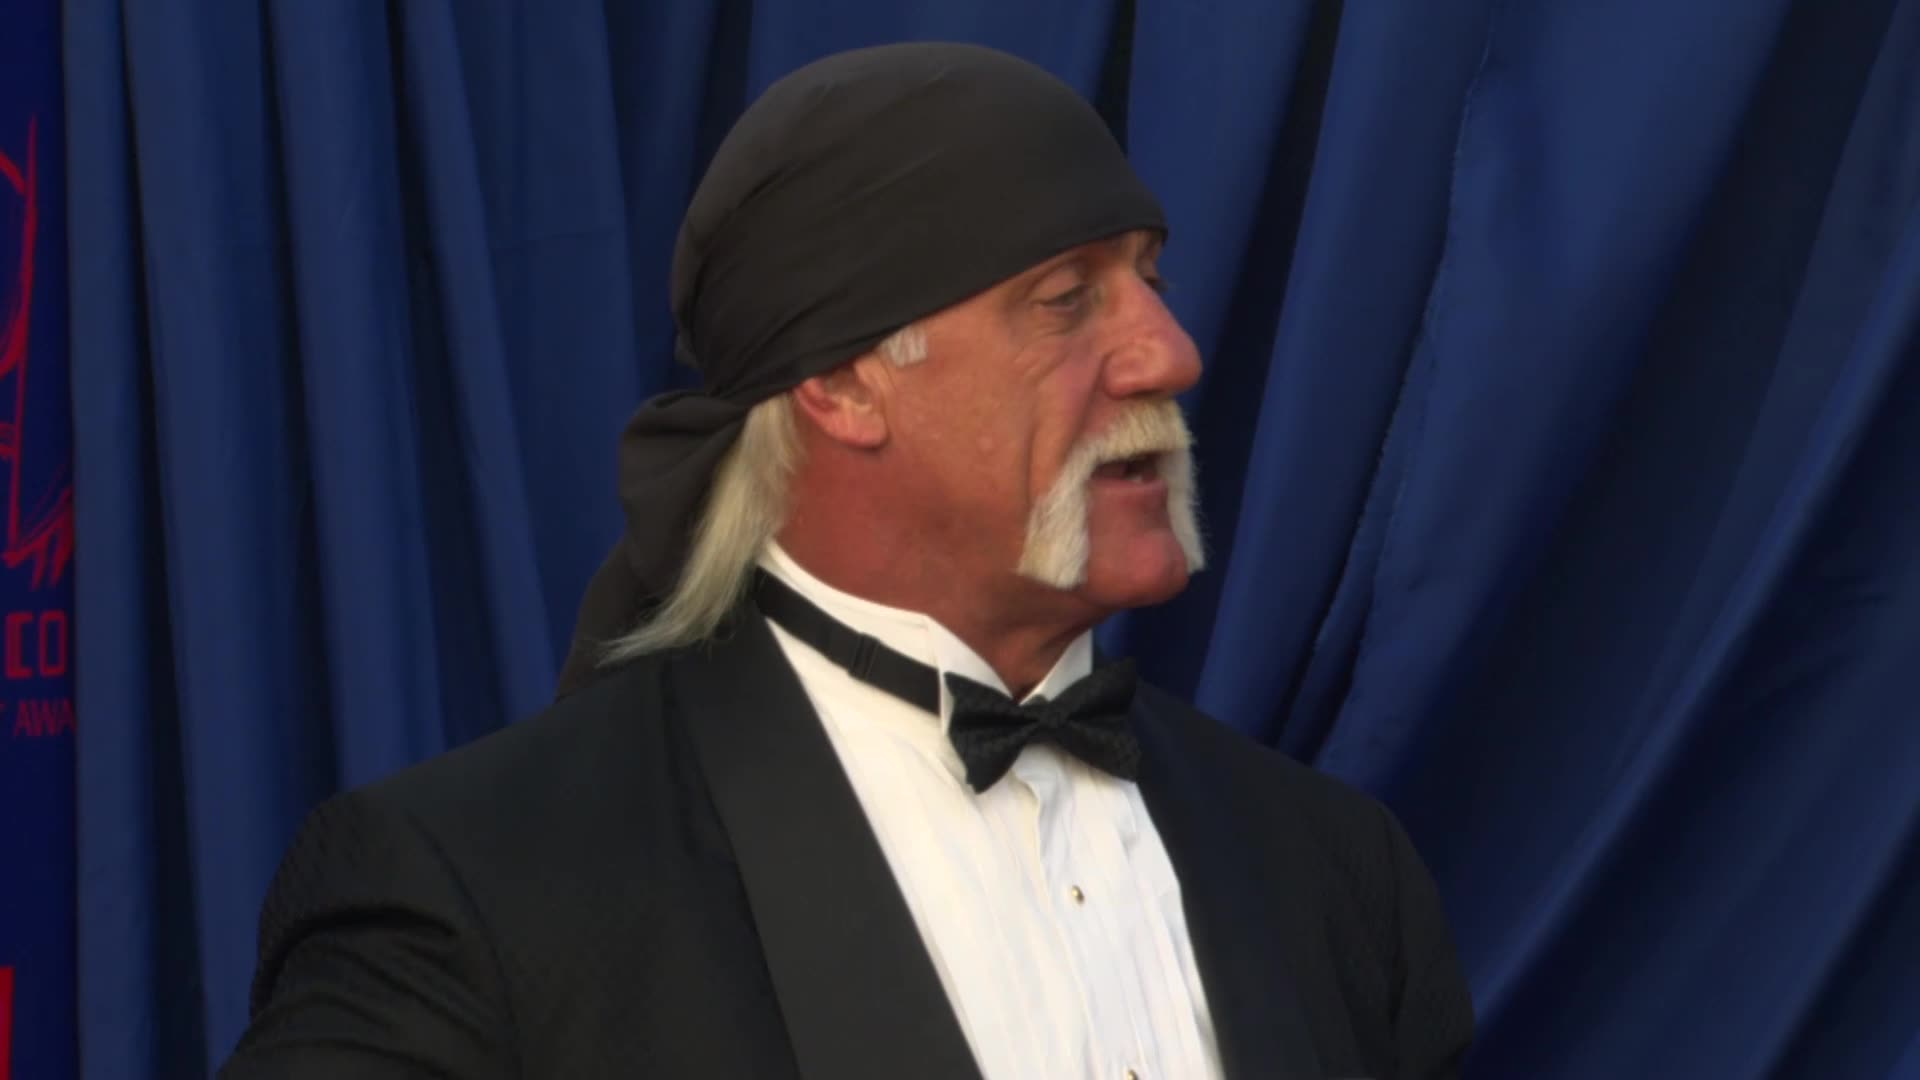 Dwayne 'The Rock' Johnson Responds To Hulk Hogan's Racist Rant